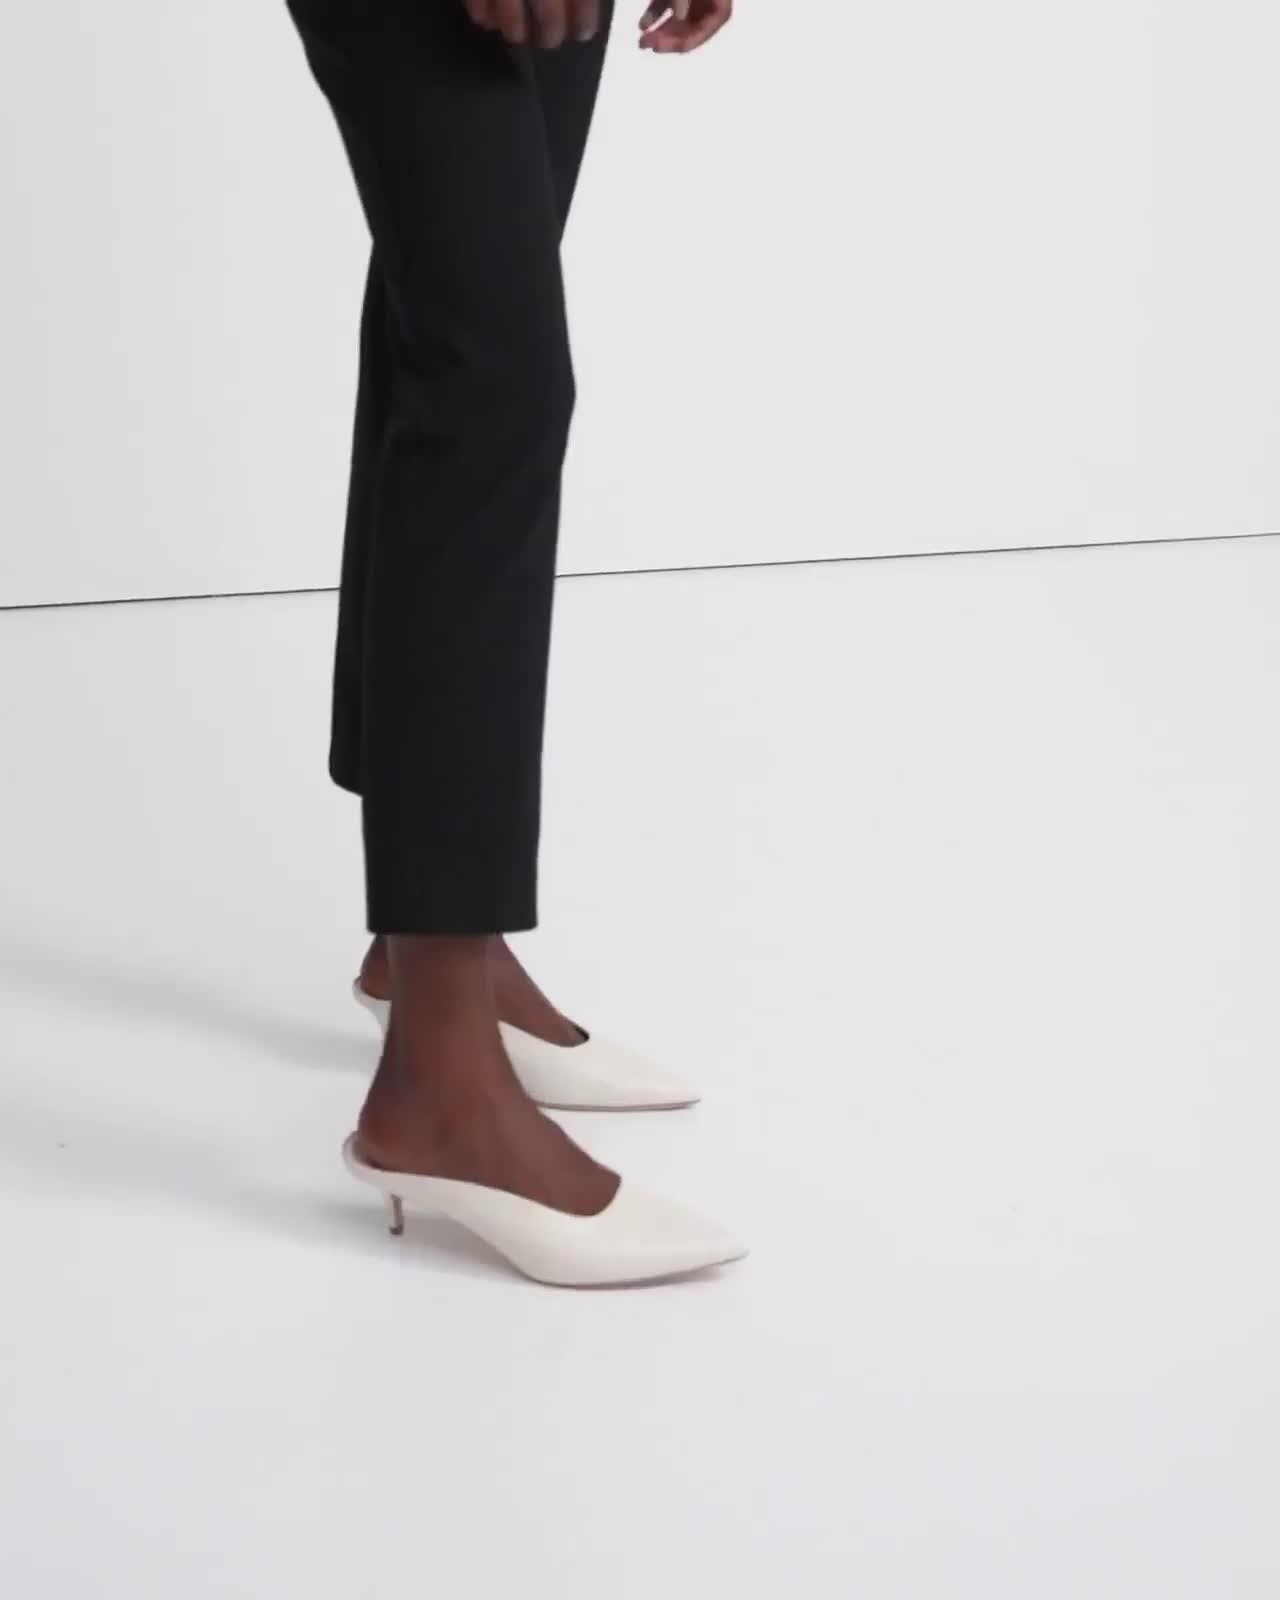 Skinny Legging in Eco Stretch Cotton